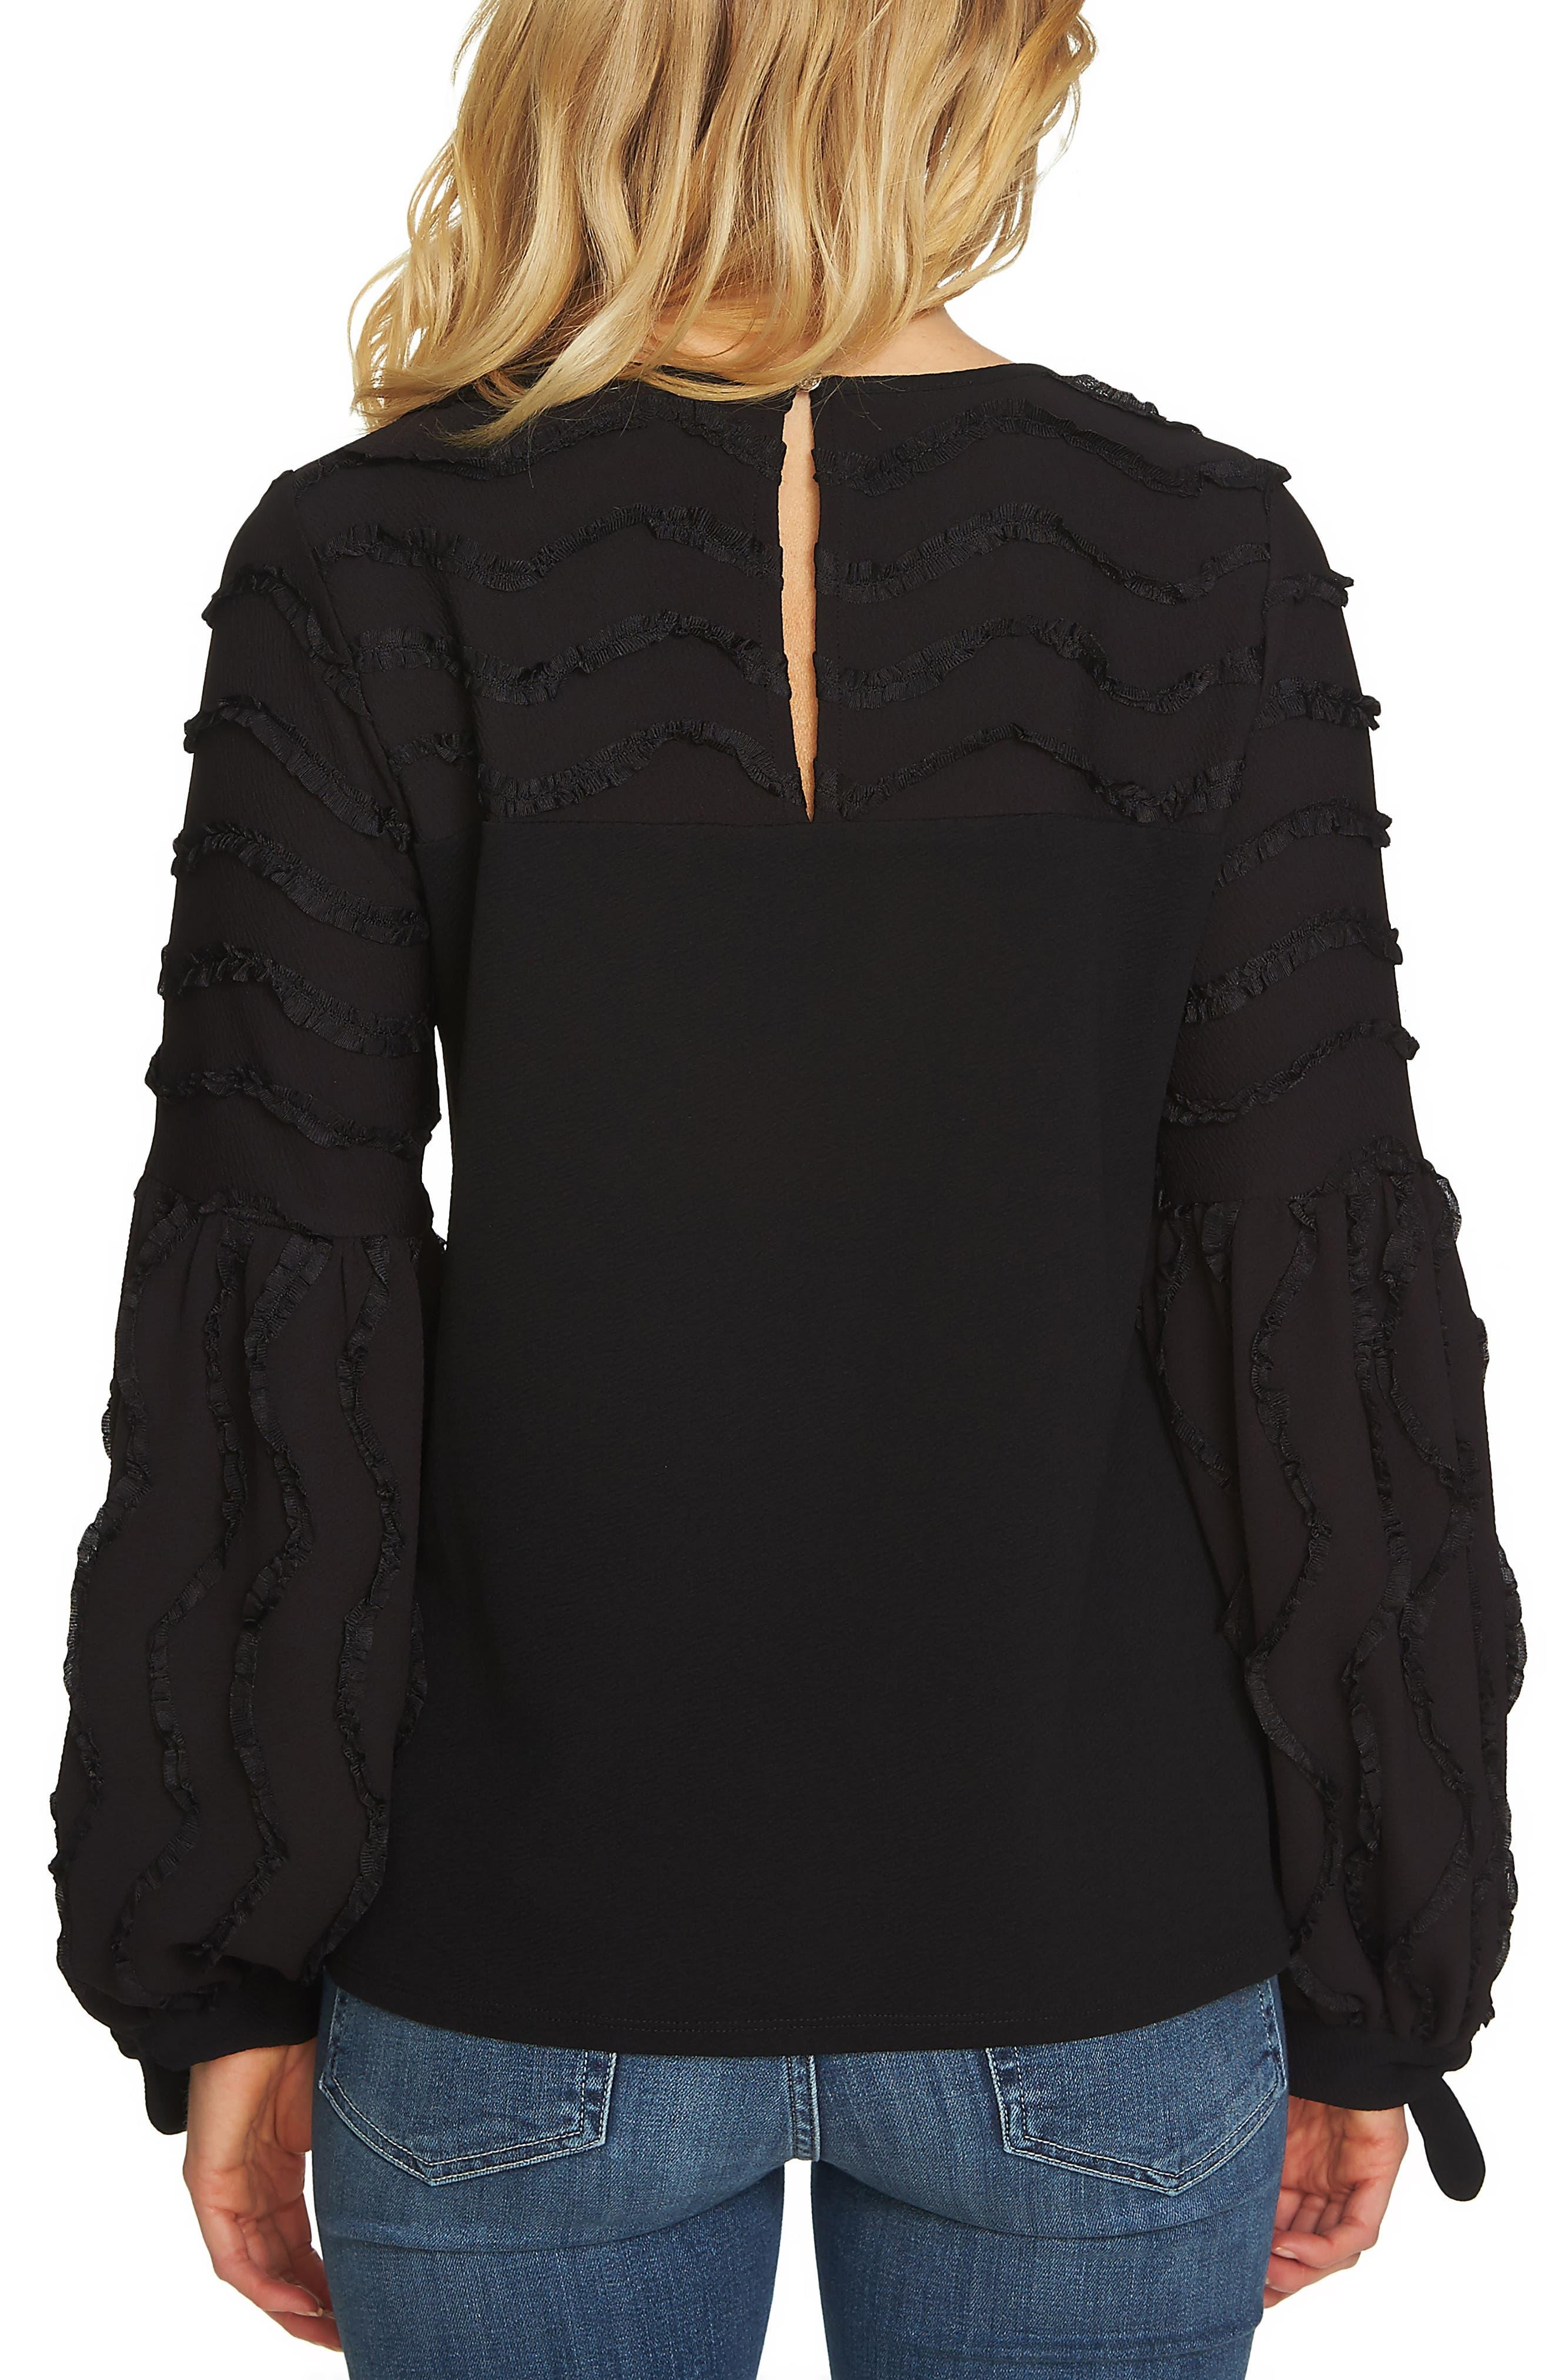 Balloon Sleeve Textured Knit Top,                             Alternate thumbnail 2, color,                             Rich Black